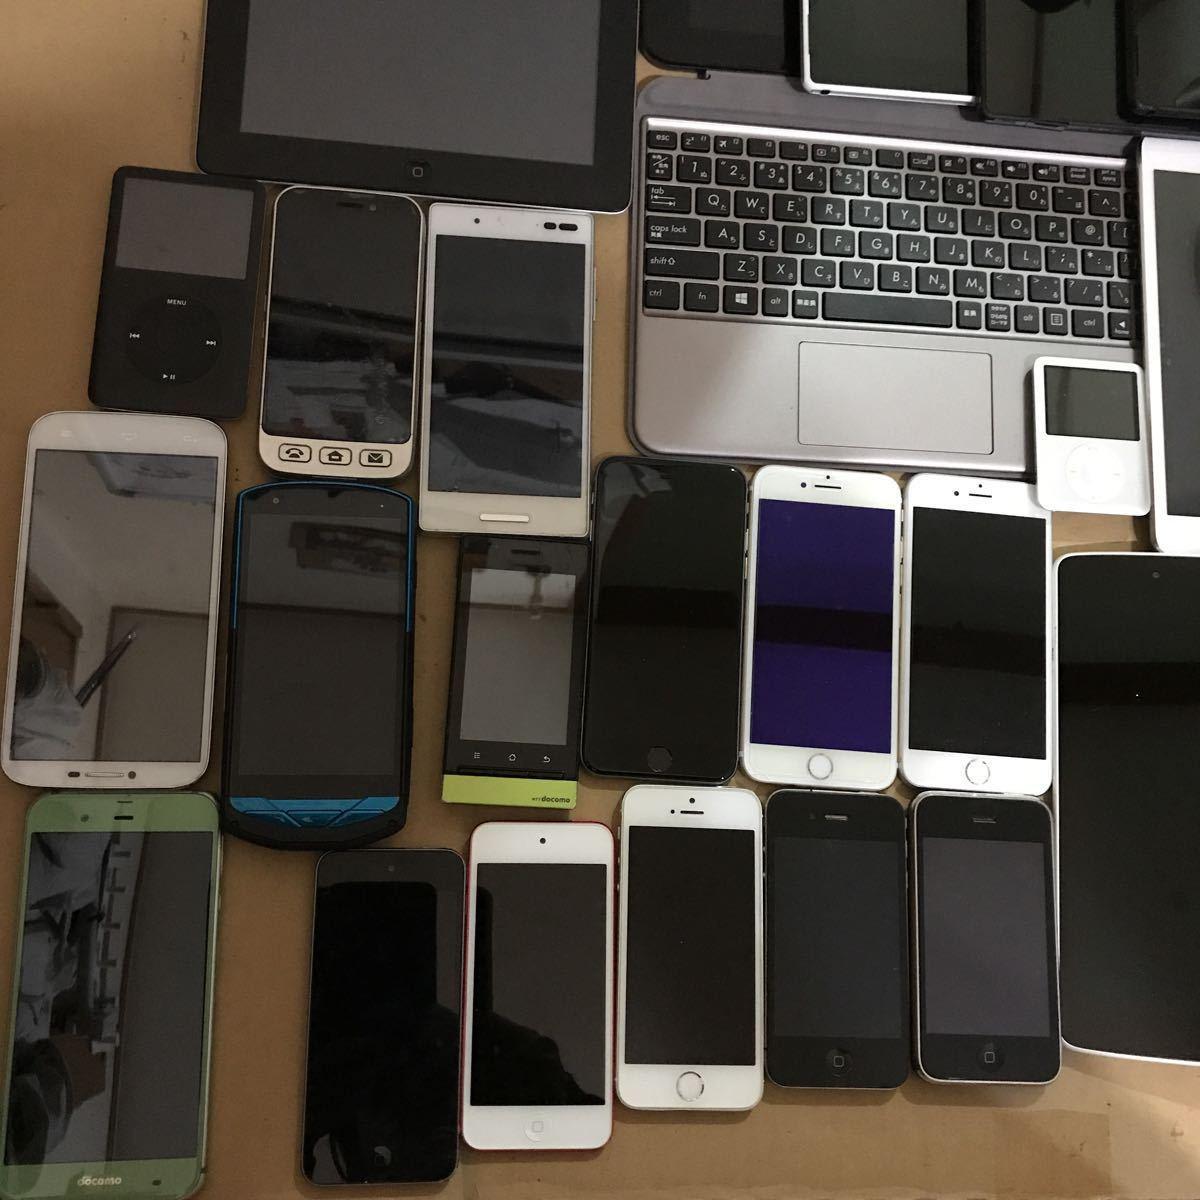 Tablet タブレット スマホ スマートフォン iPhone iPad iPod xperia arrows asus HUAWEI AQUOS docomo ジャンク まとめ 大量 1円_画像5